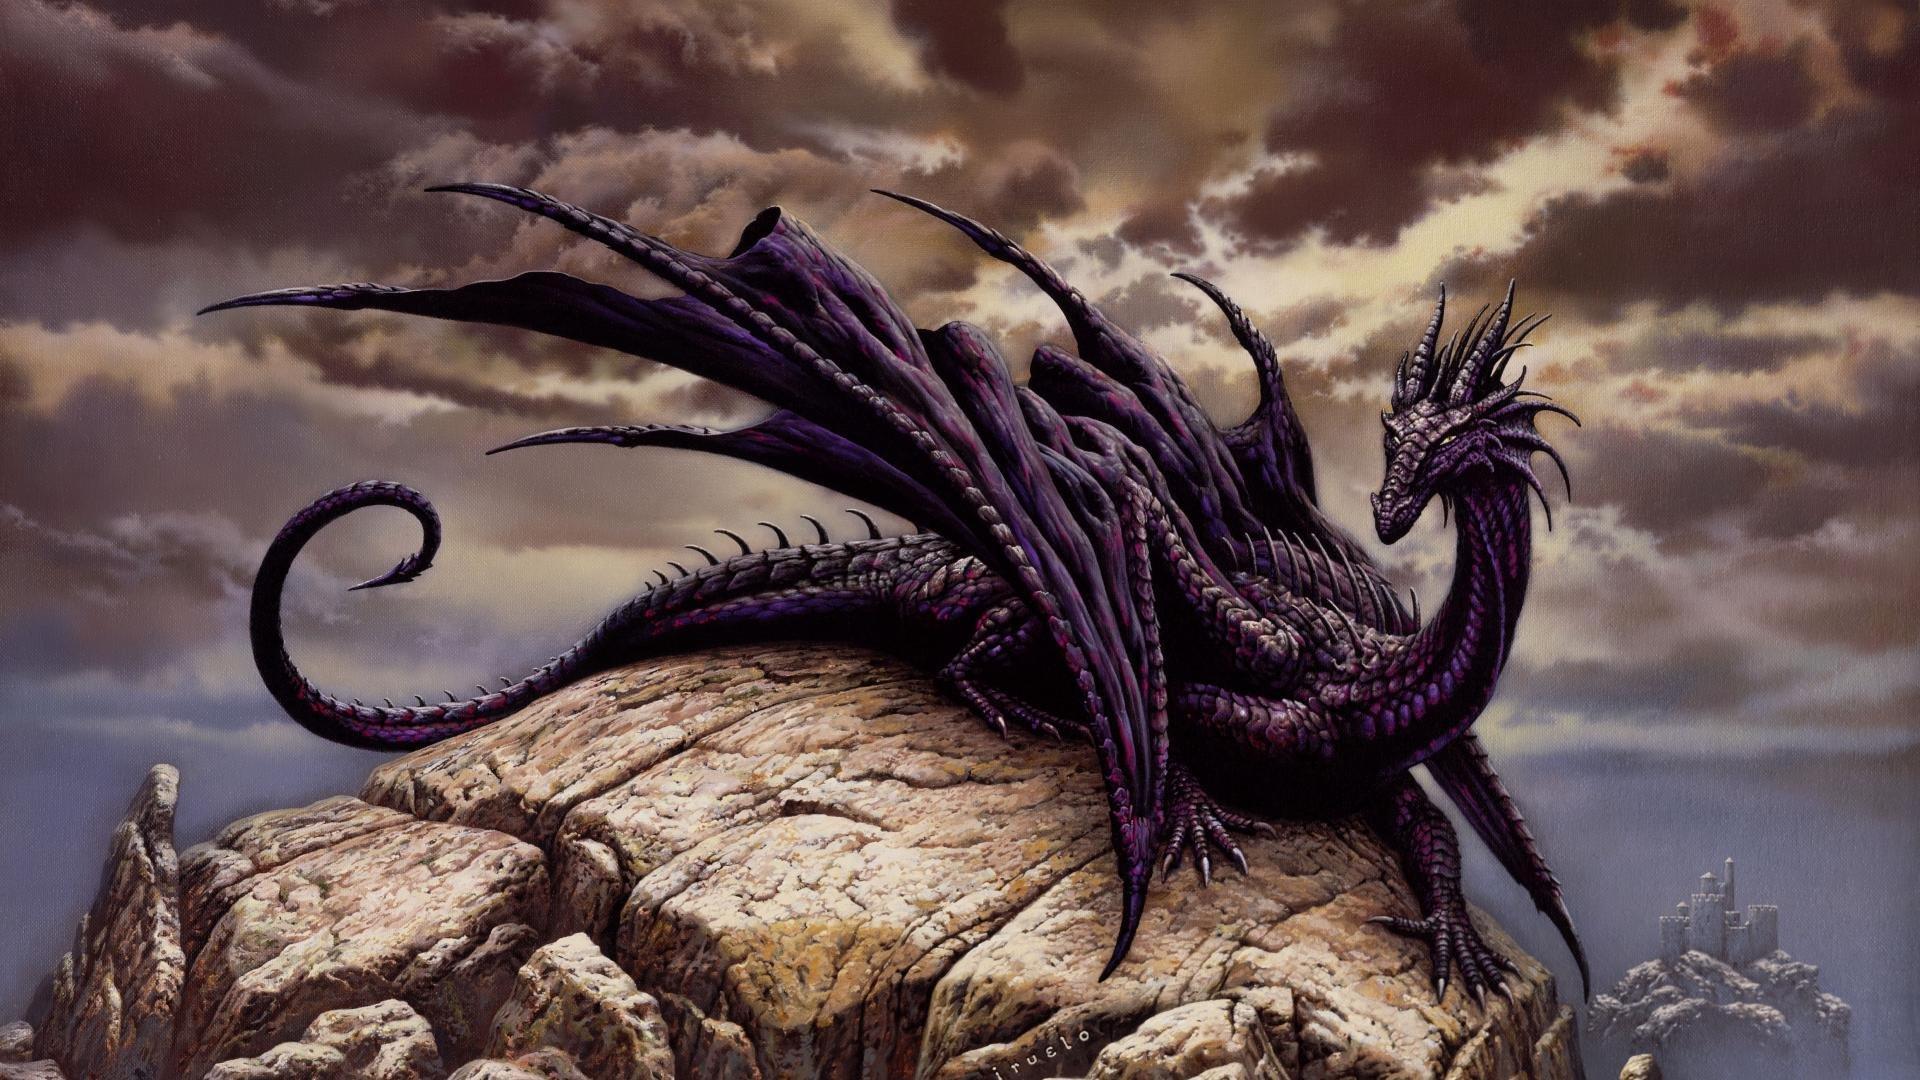 fantasy art artwork dragon monster creature wallpaper 1920x1080